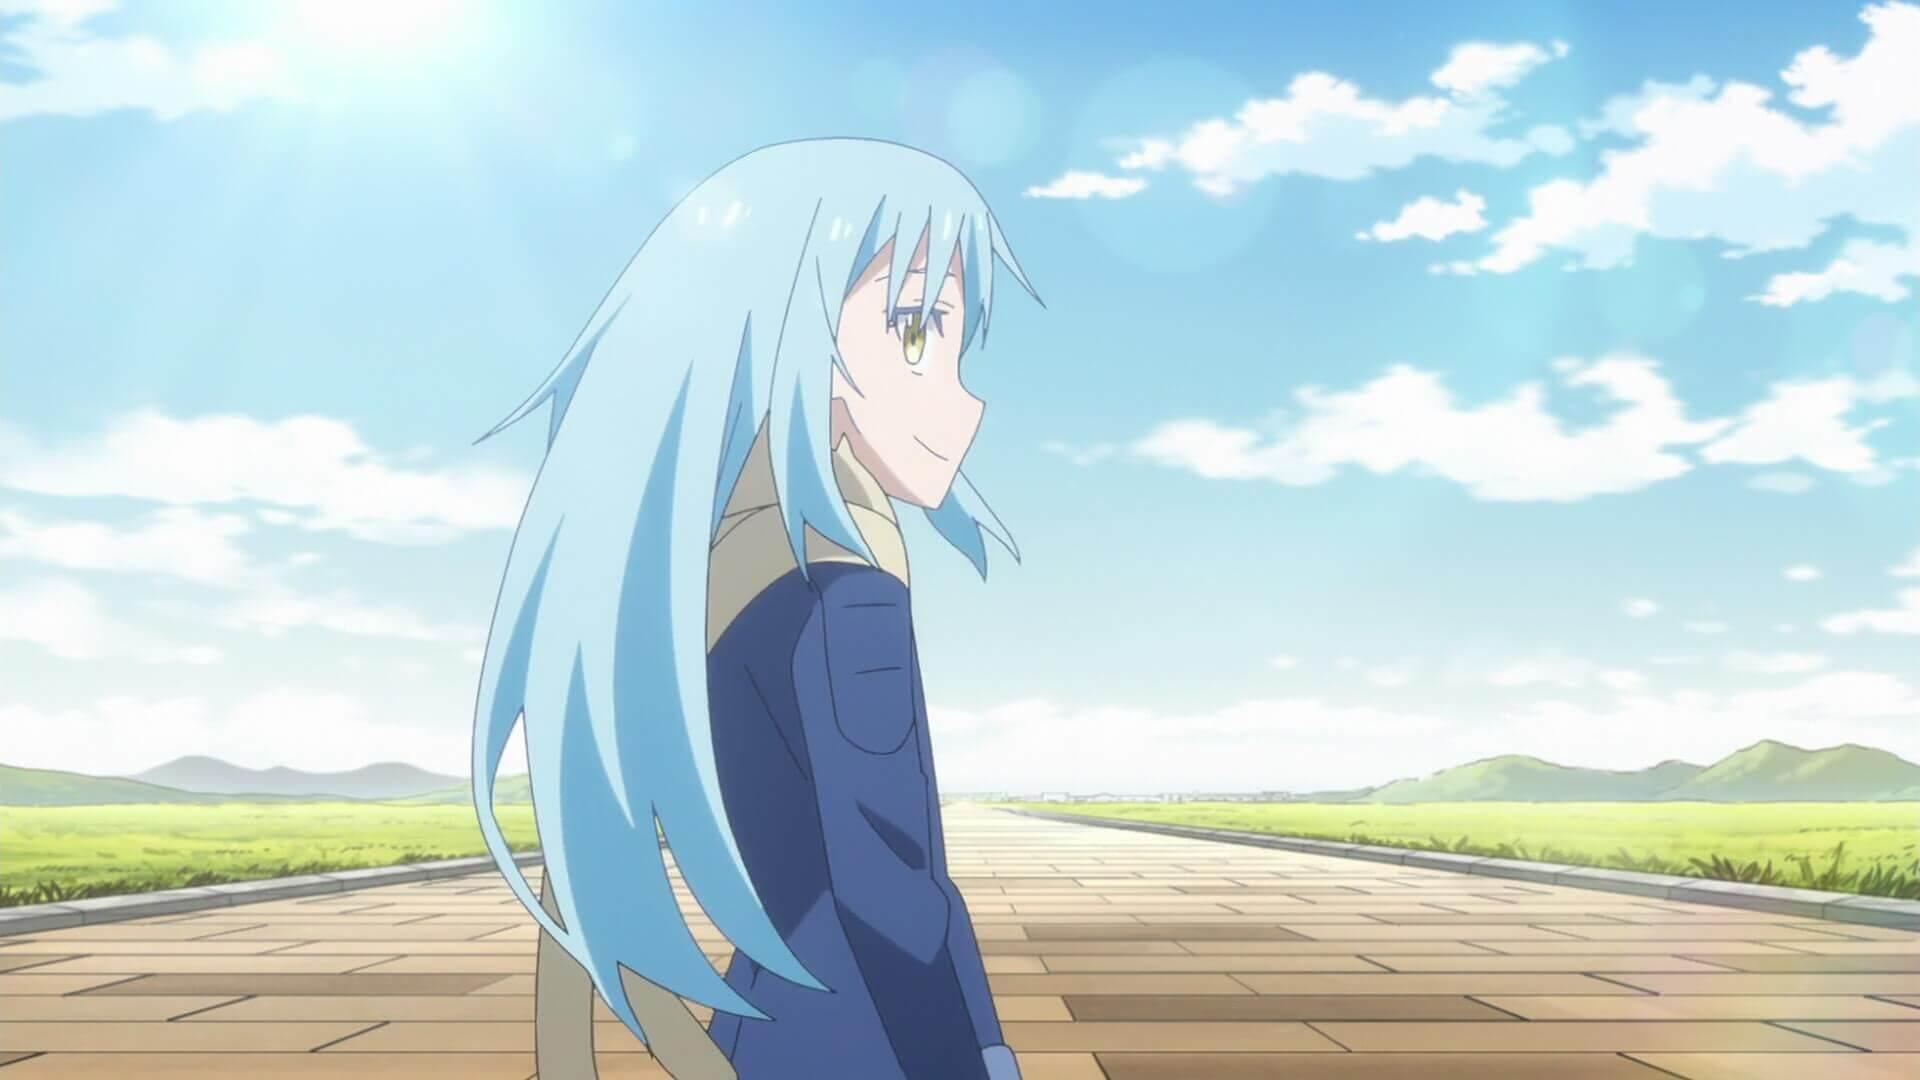 Slime anime season 2 beautiful photo